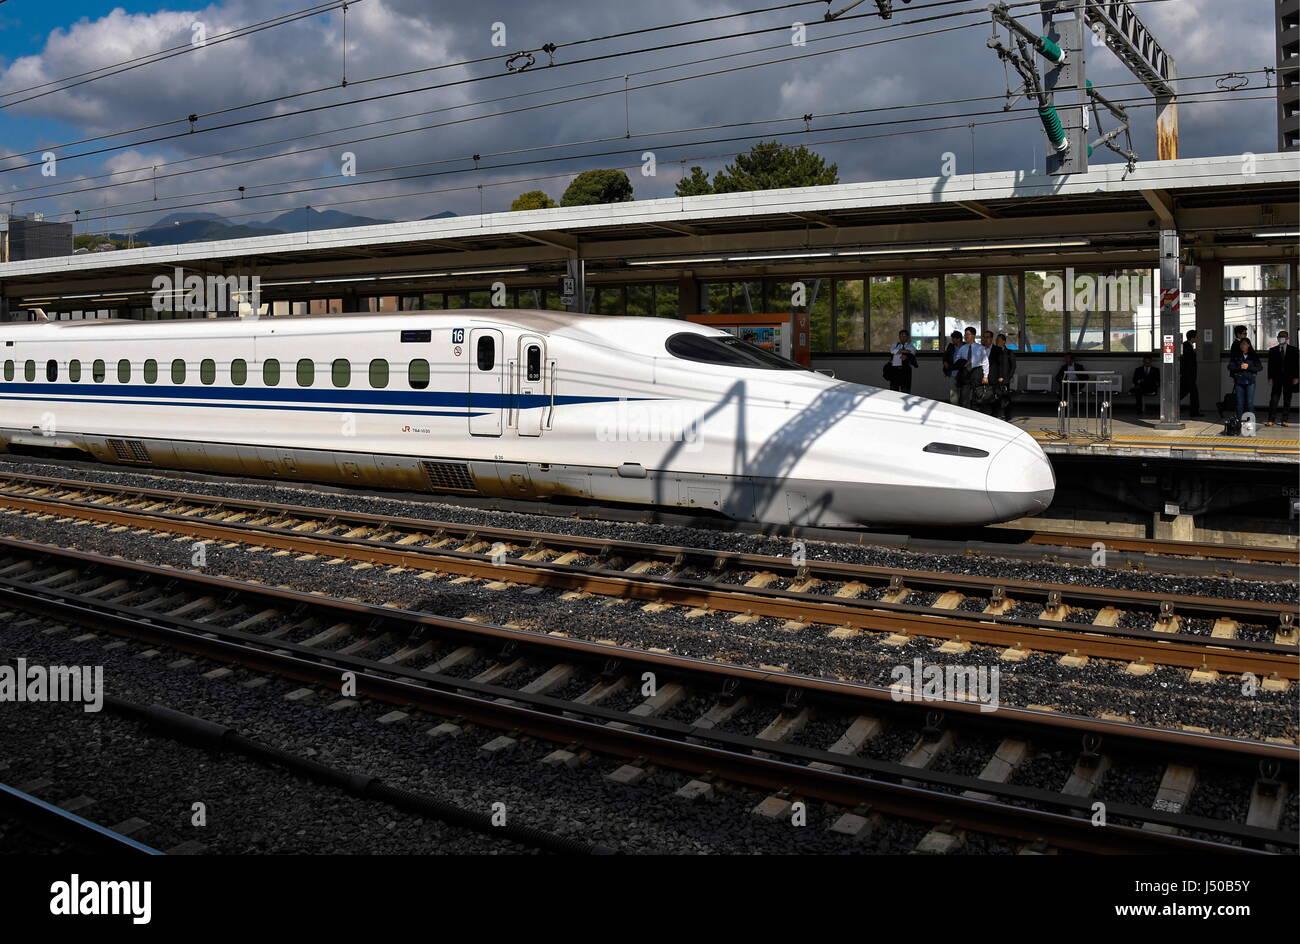 Odawara, Japan. 15th May, 2017. A Nozomi train of the Shinkansen high-speed railway lines seen at Odawara Station - Stock Image